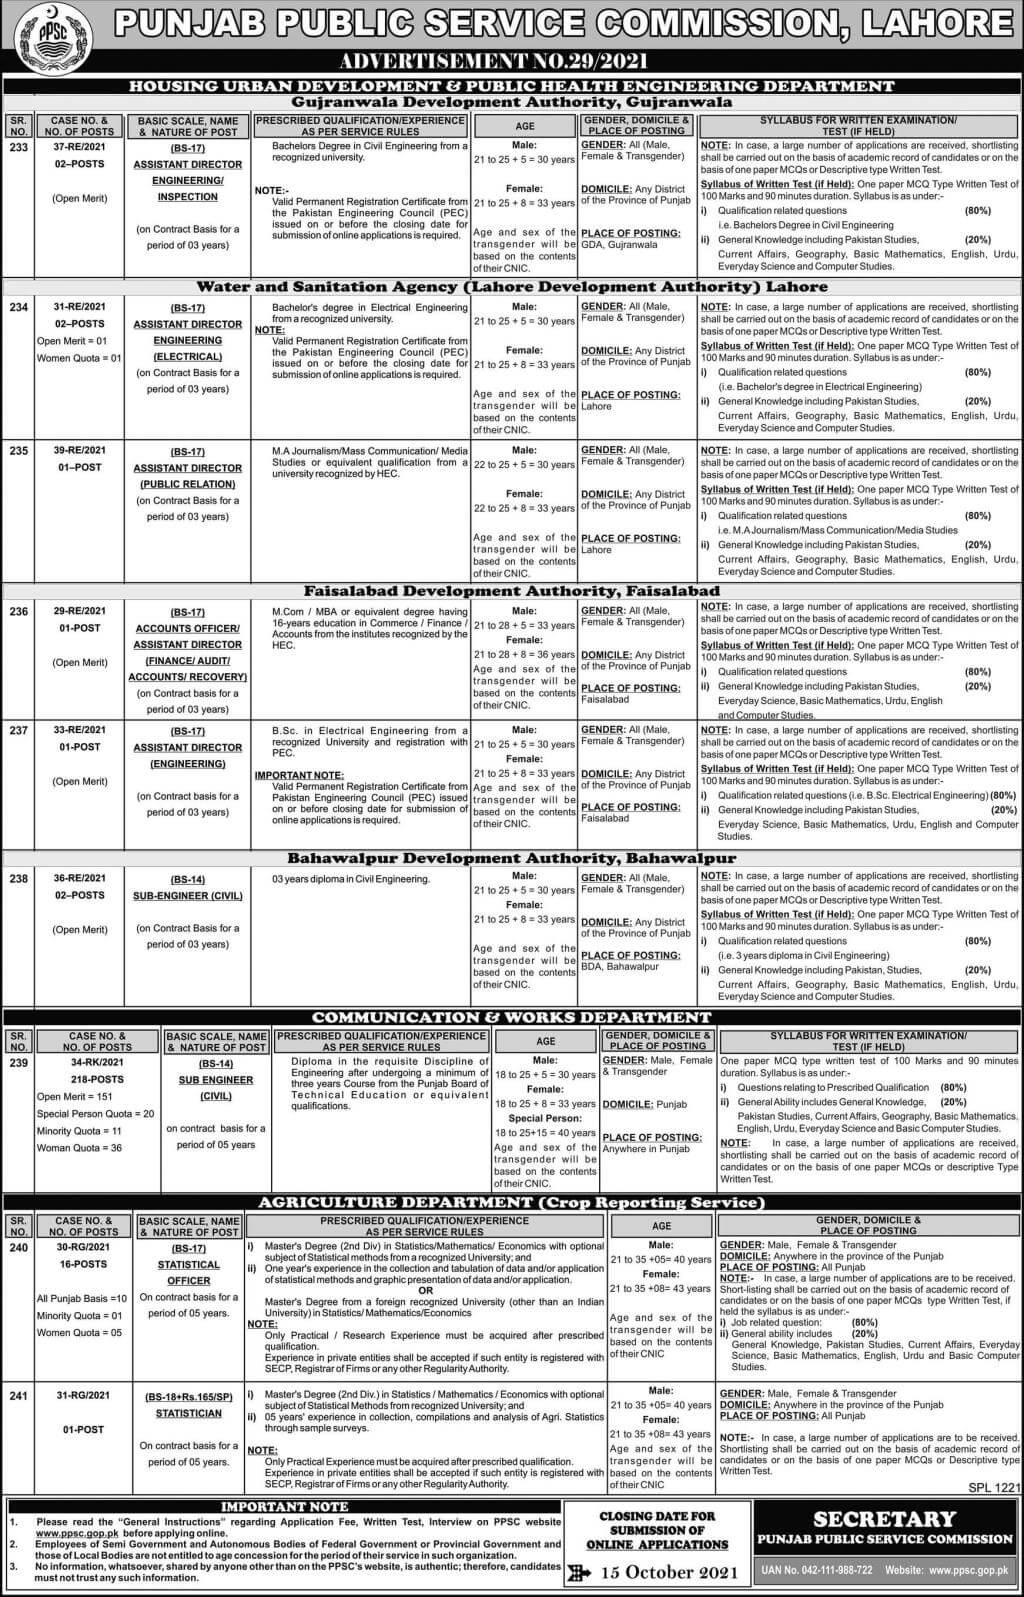 PPSC Jobs Today October 2021 Via Punjab Public Service Commission